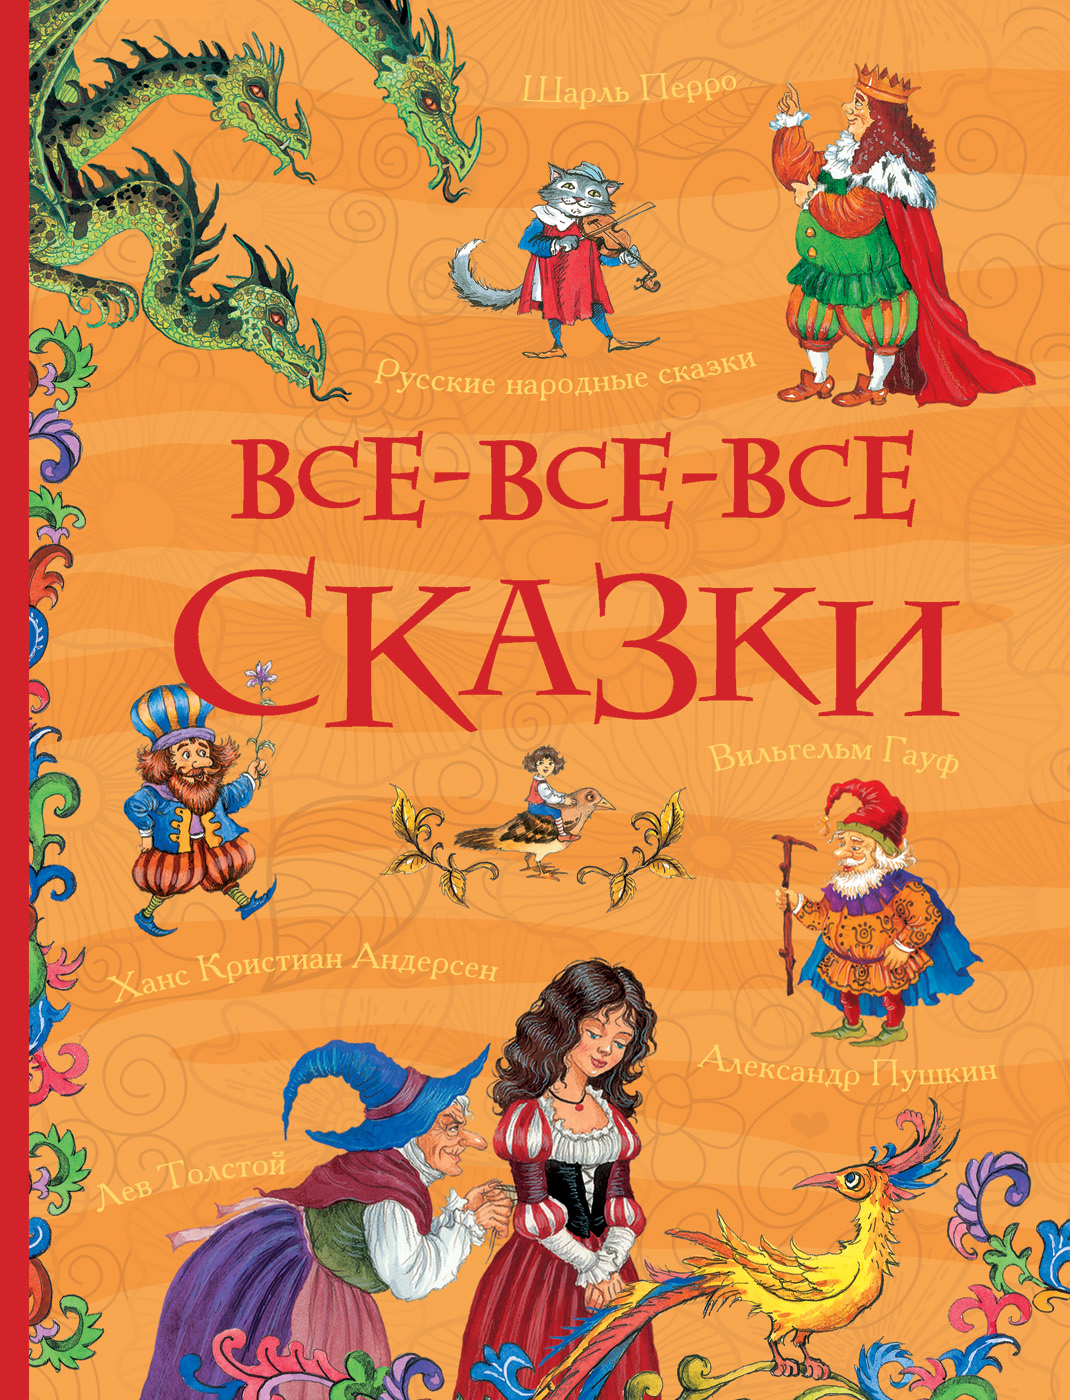 Андерсен Х.-К., Пушкин А. С., Толстой А. Н. Все-все-все сказки (Все истории)